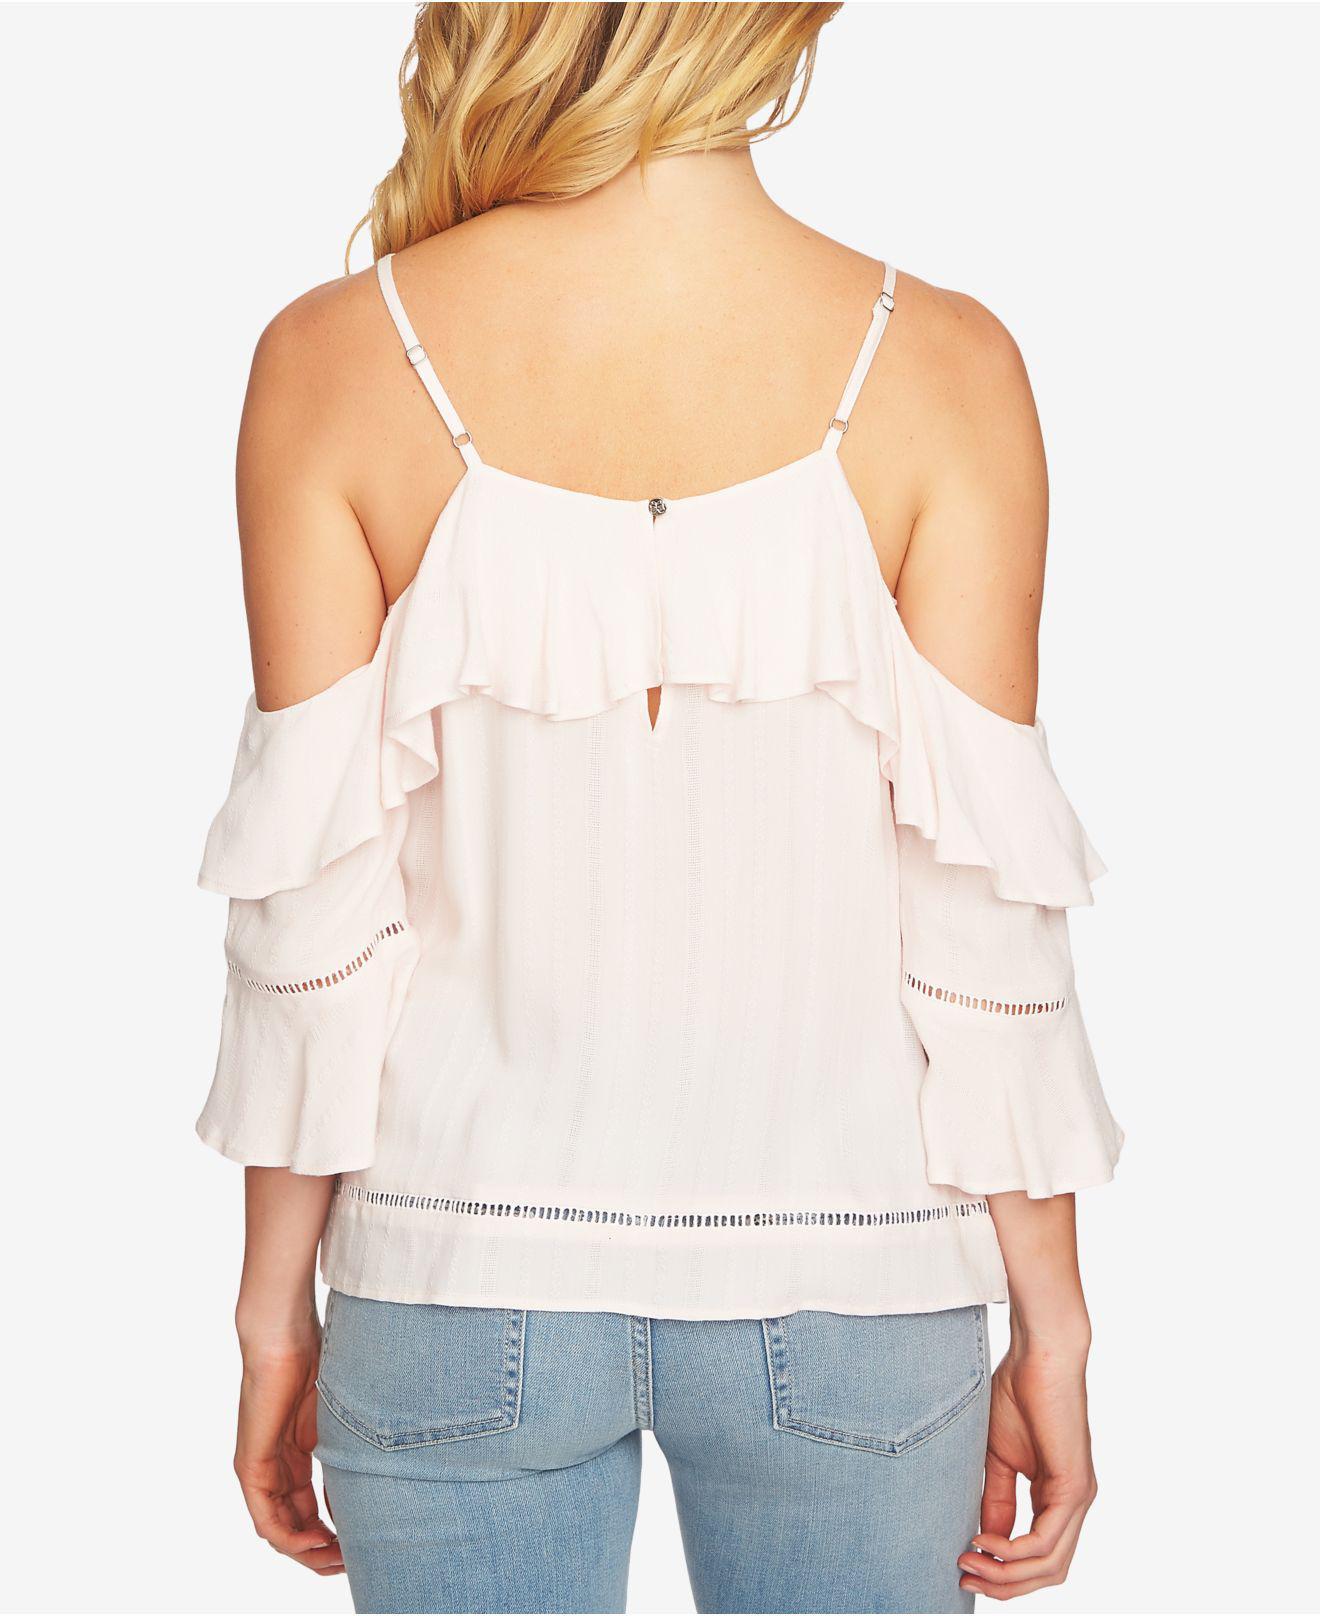 a003f1ff5baf4 Lyst - Cece Ruffled Cold-shoulder Top in Pink